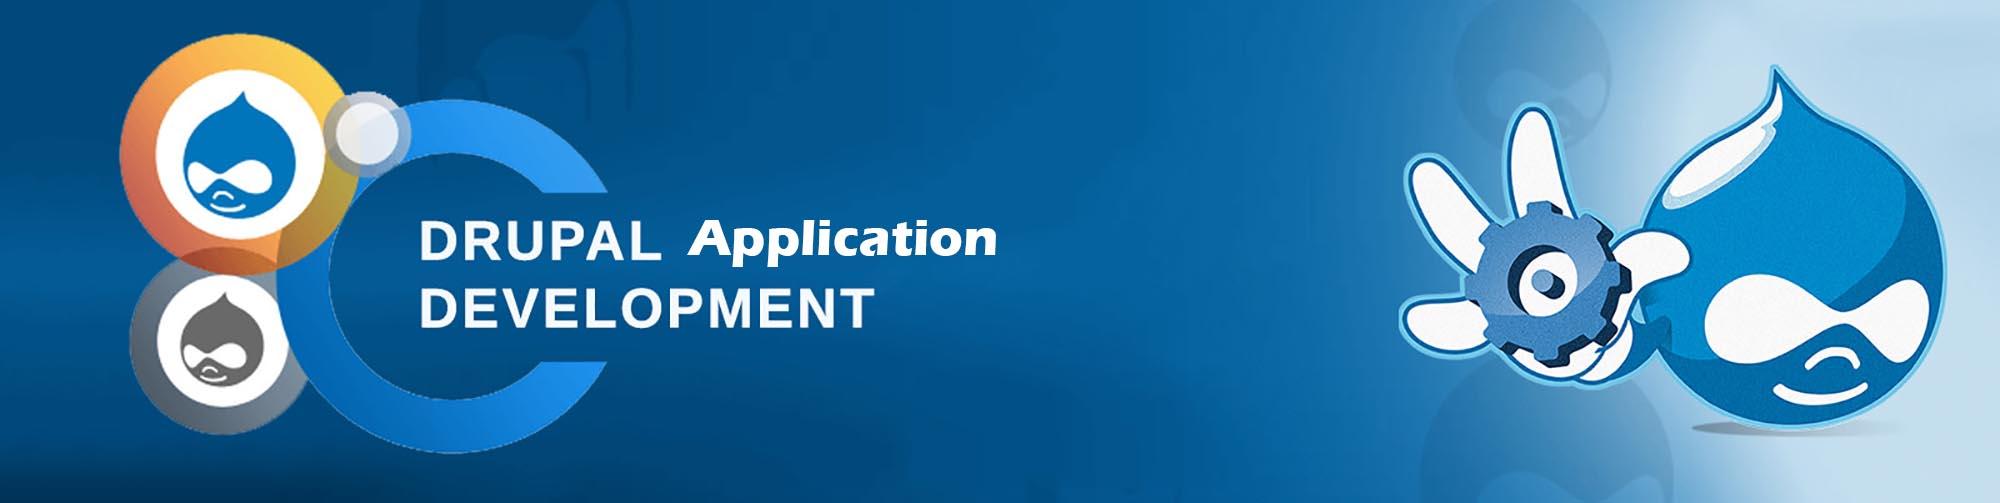 Drupal Application Development